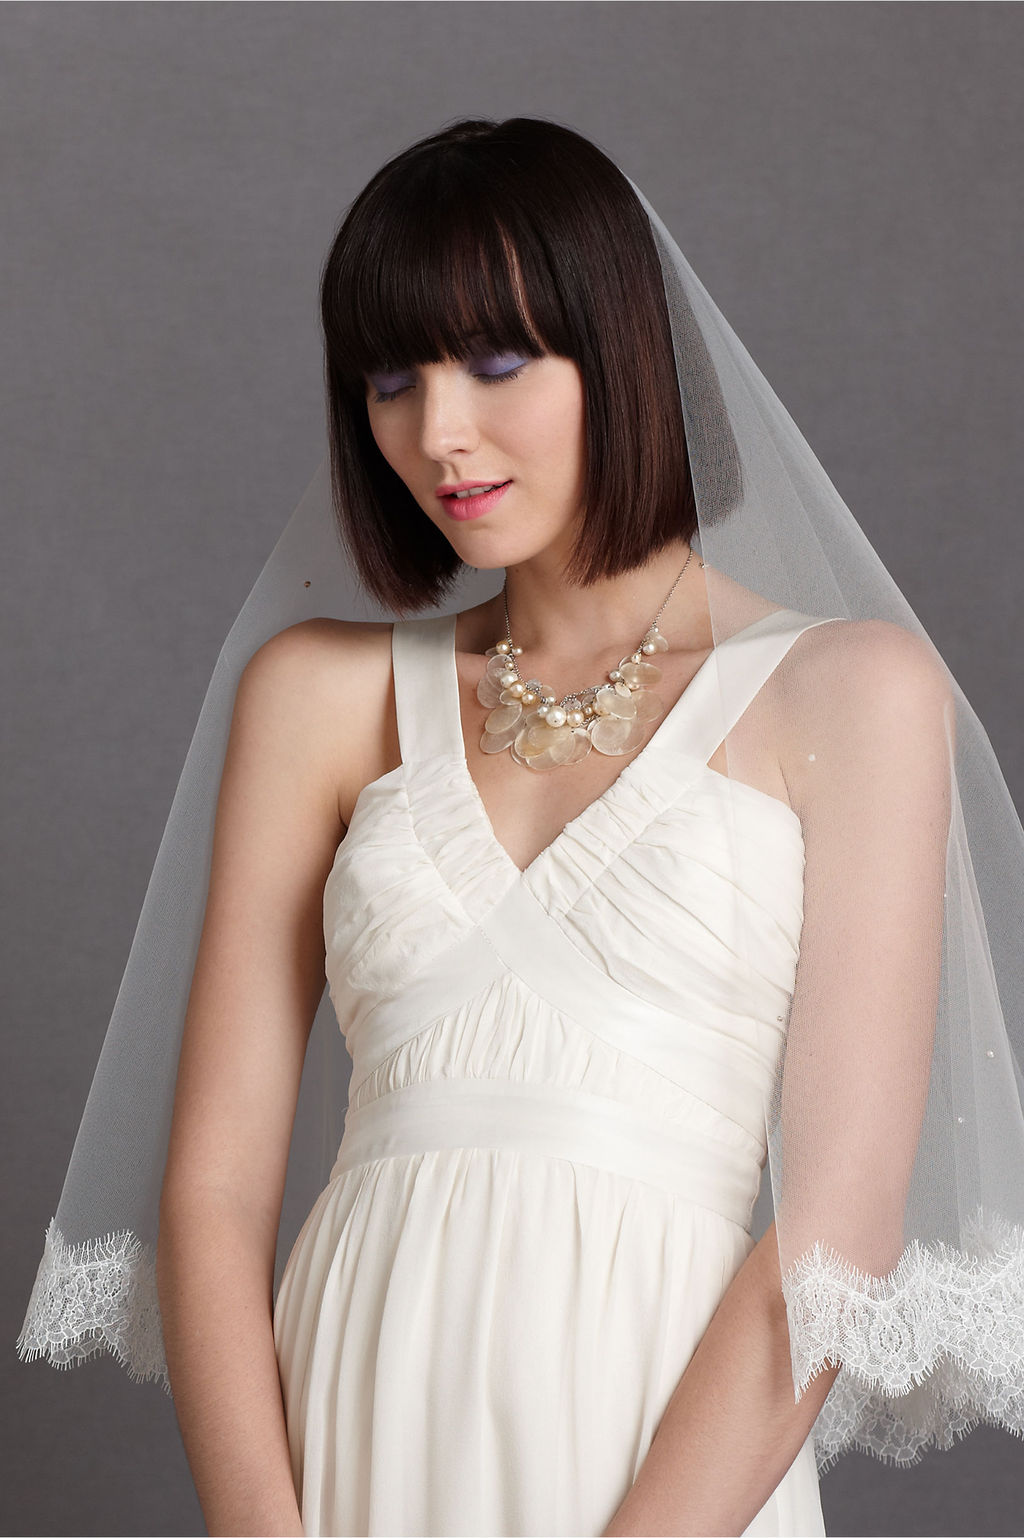 Bhldn-bridal-veils-mantilla-style-for-romantic-brides.full